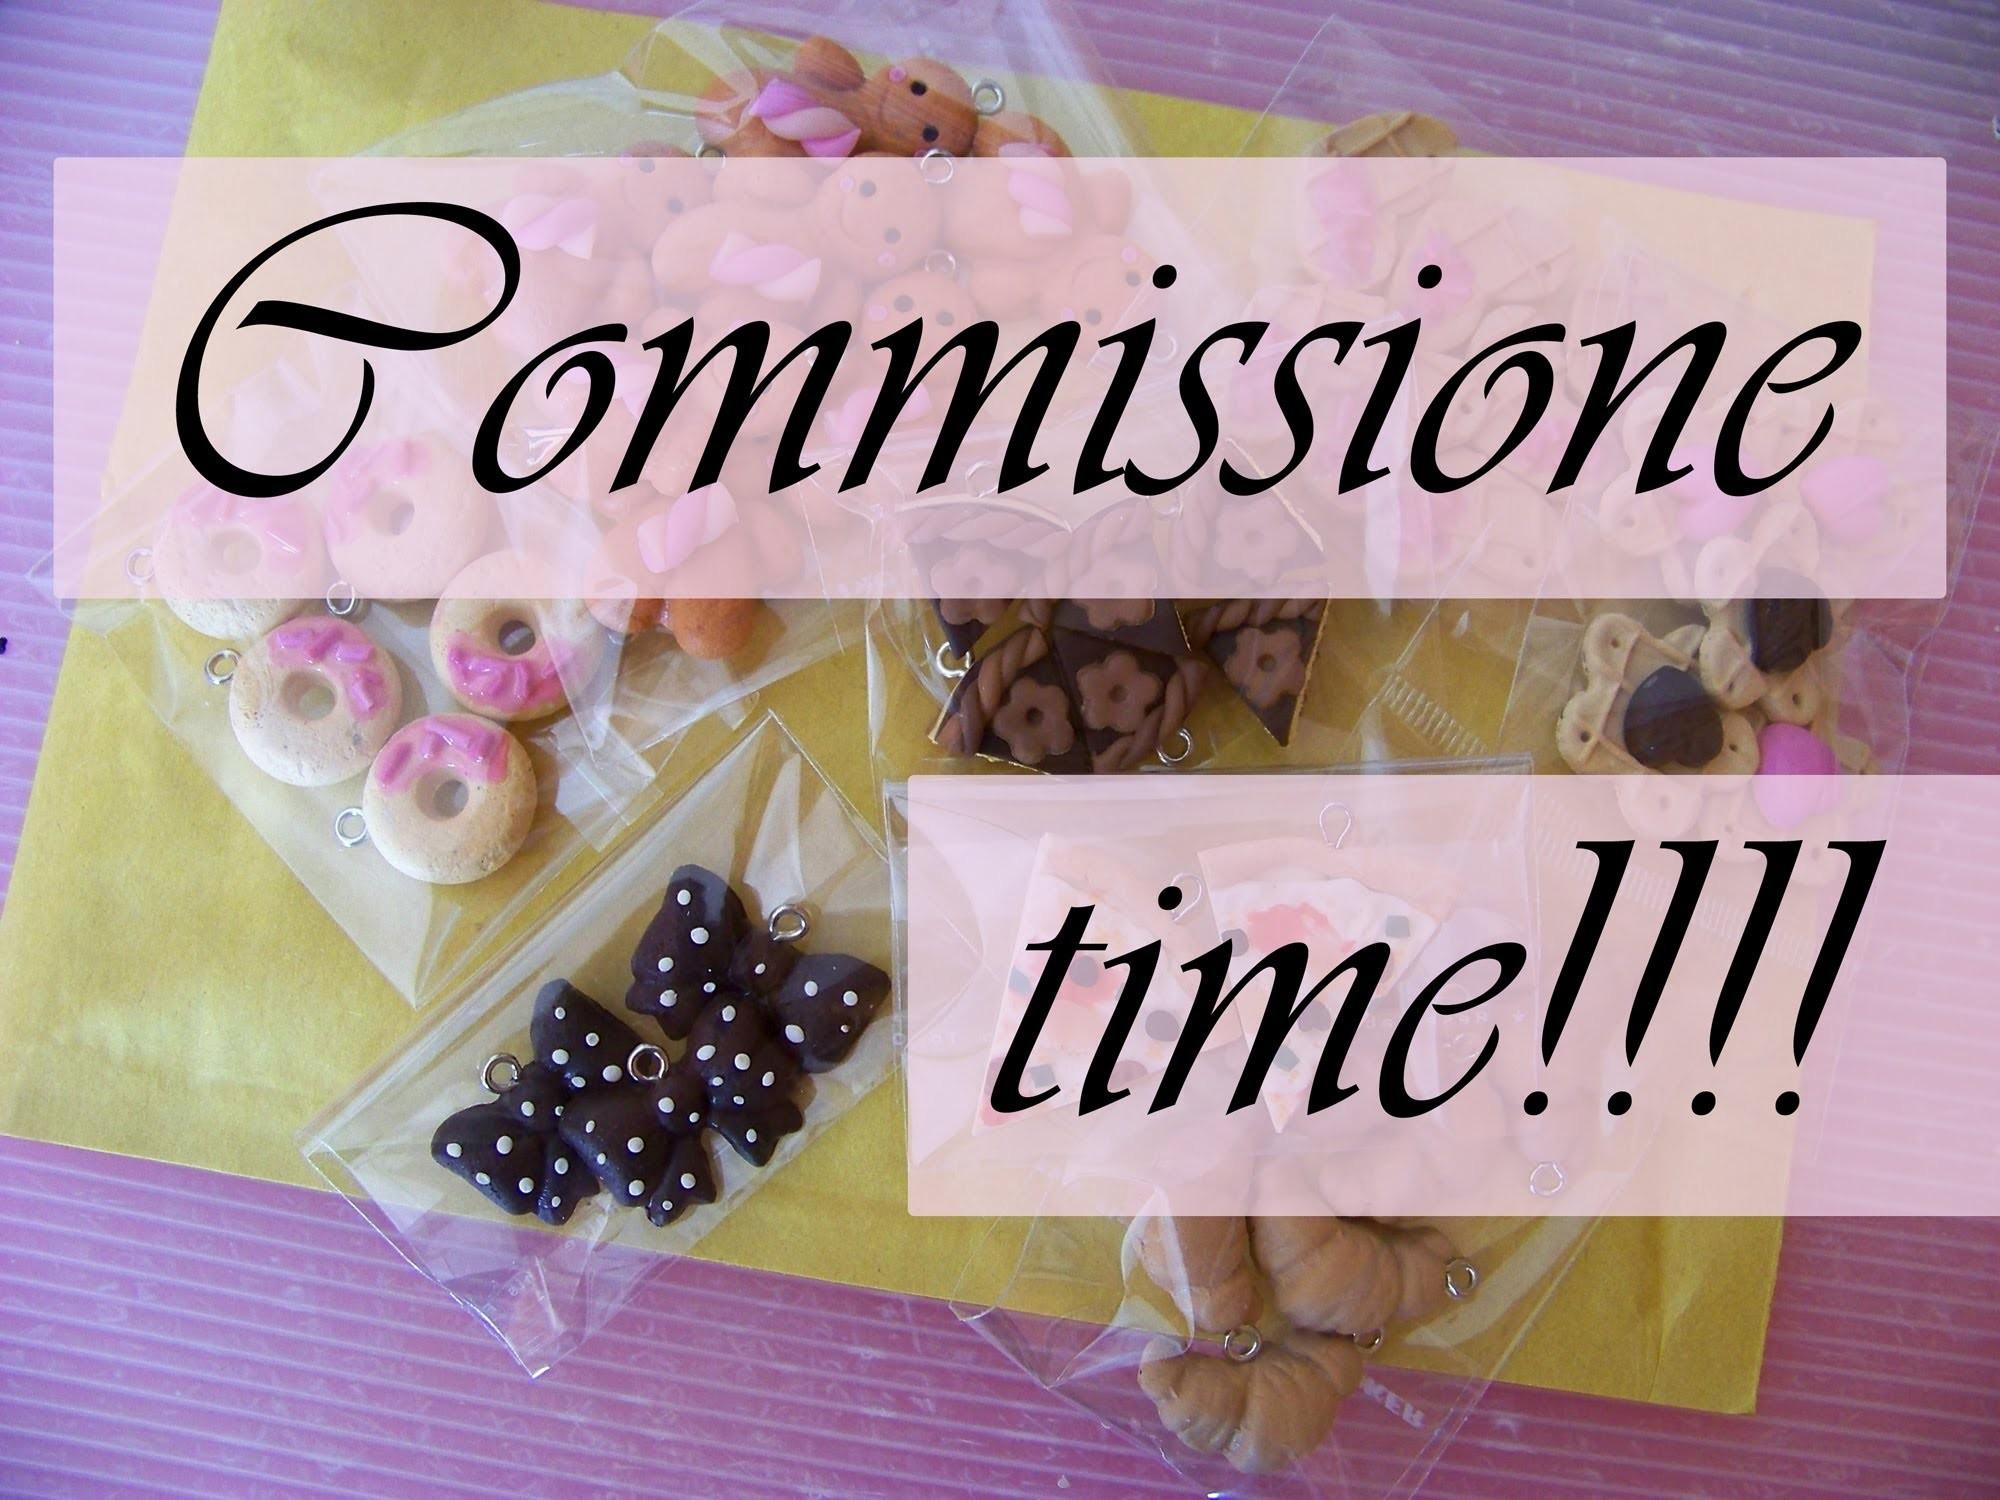 Commissione Time!! - ciondoli sfusi - charms - polymer clay